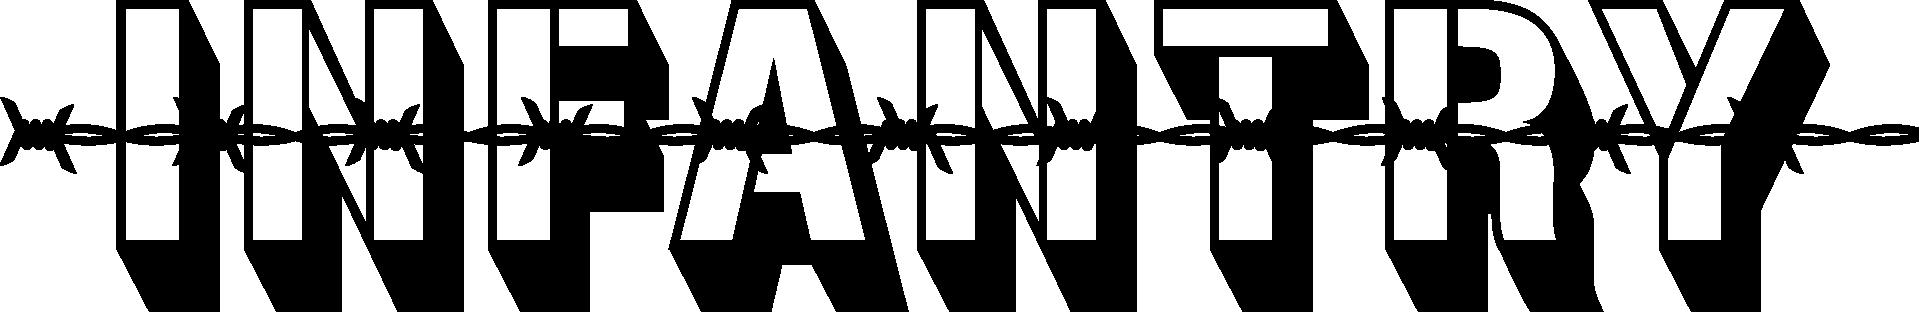 Infantry LogoFinal.png